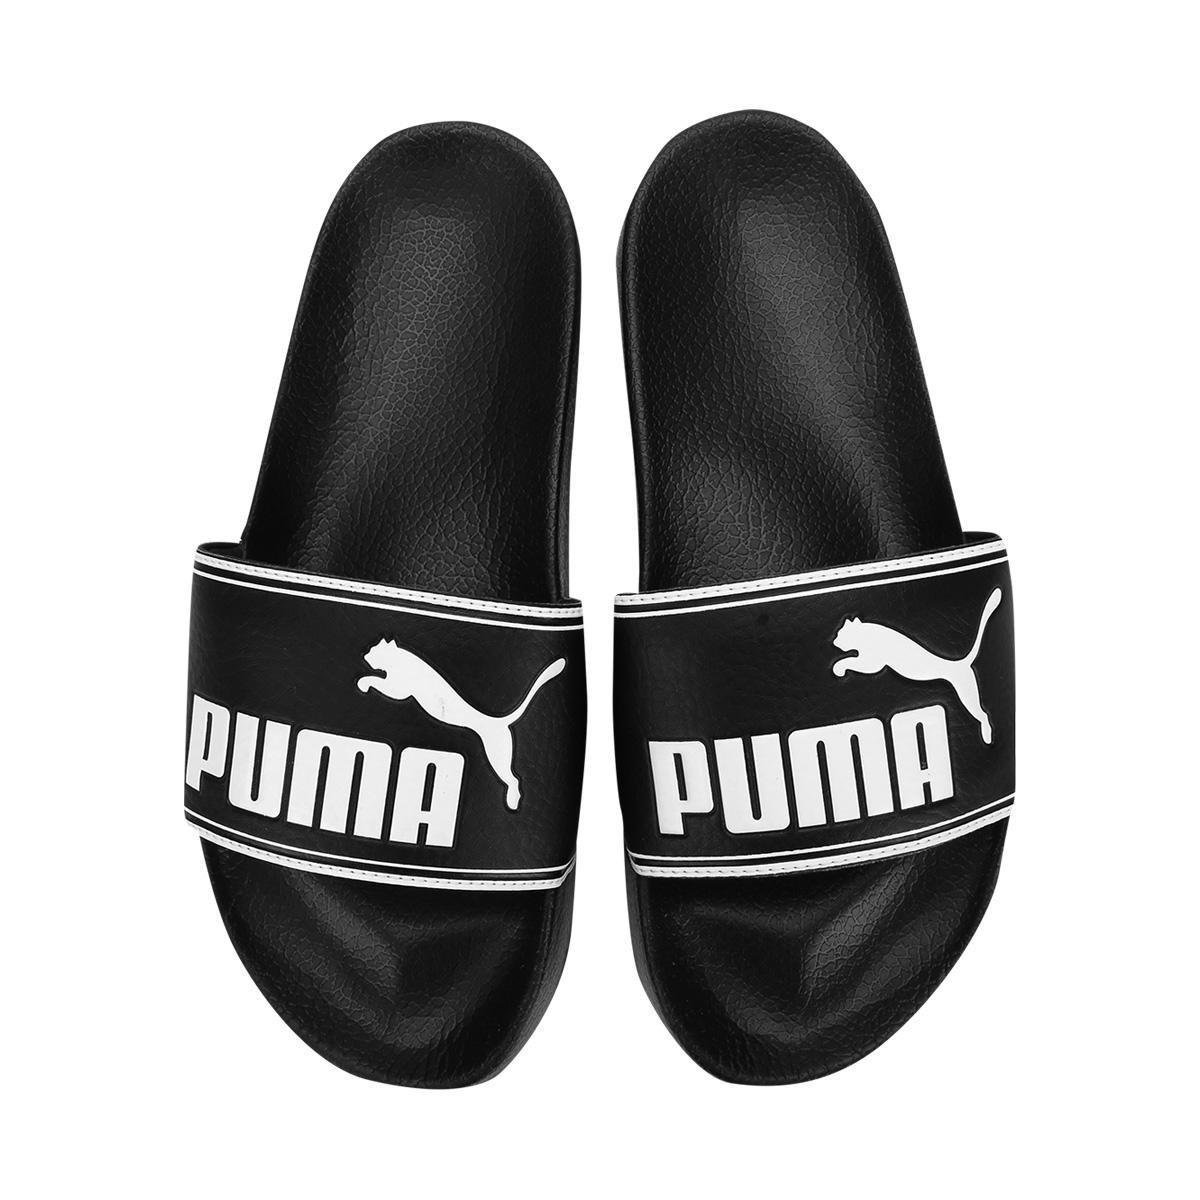 Chinelo Puma Leadcat Slide - Branco e Preto - Compre Agora  437fb197035